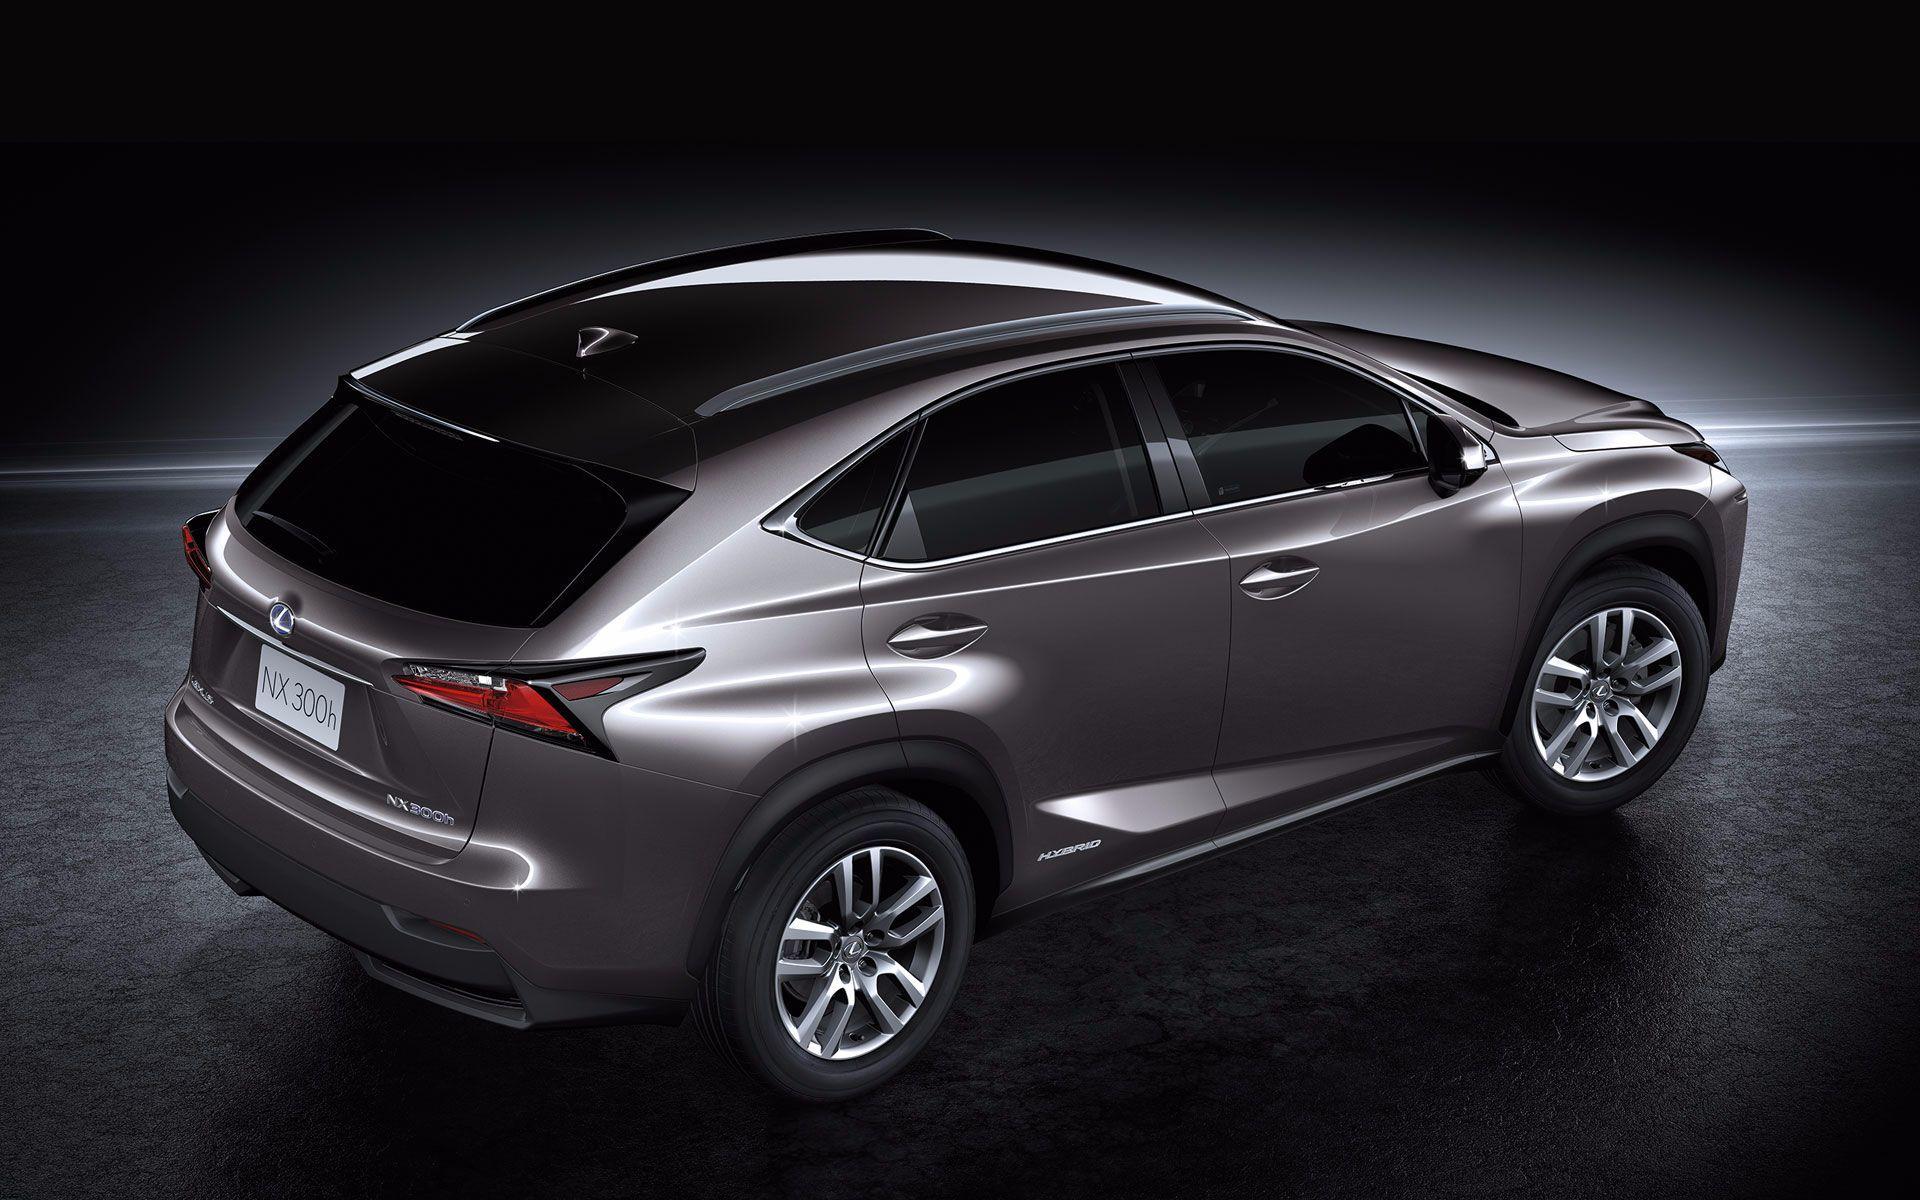 lexus nx series luxury compact suv more details